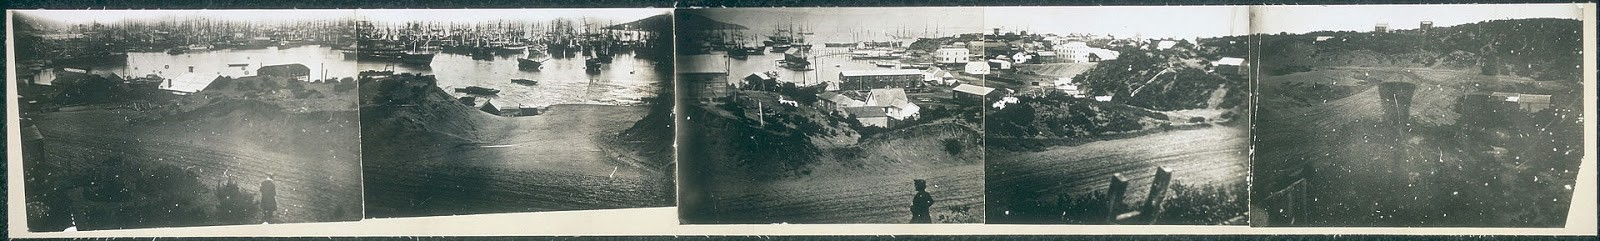 1851 view of San Francisco